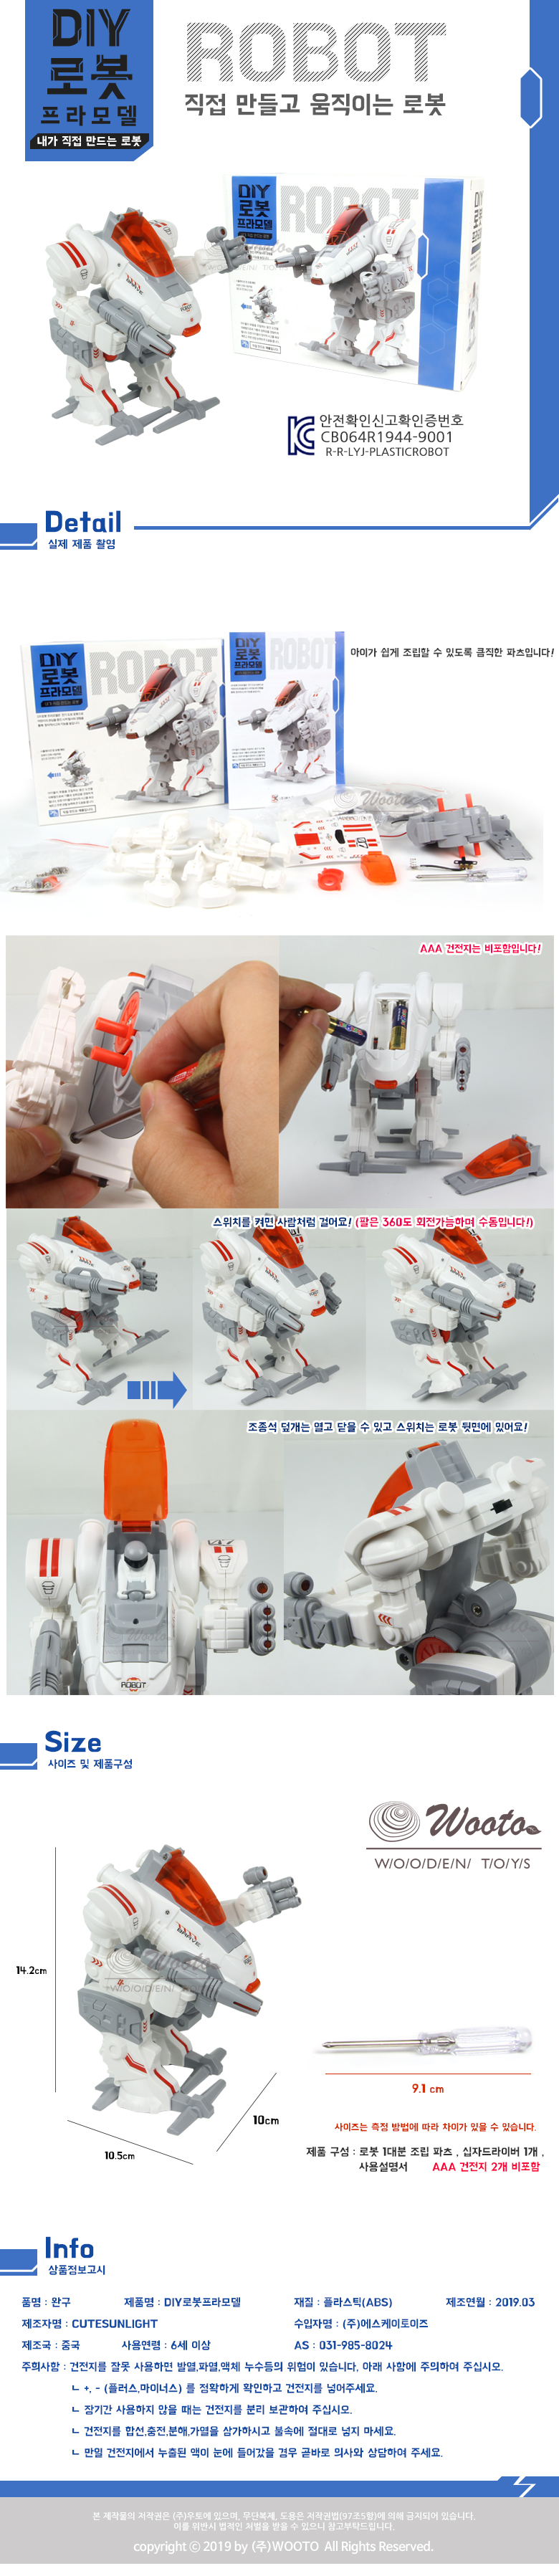 DIY 로봇 프라모델 움직이는 조립 로보트 장난감 - 우토, 11,400원, 기타 R/C , R/C 로봇